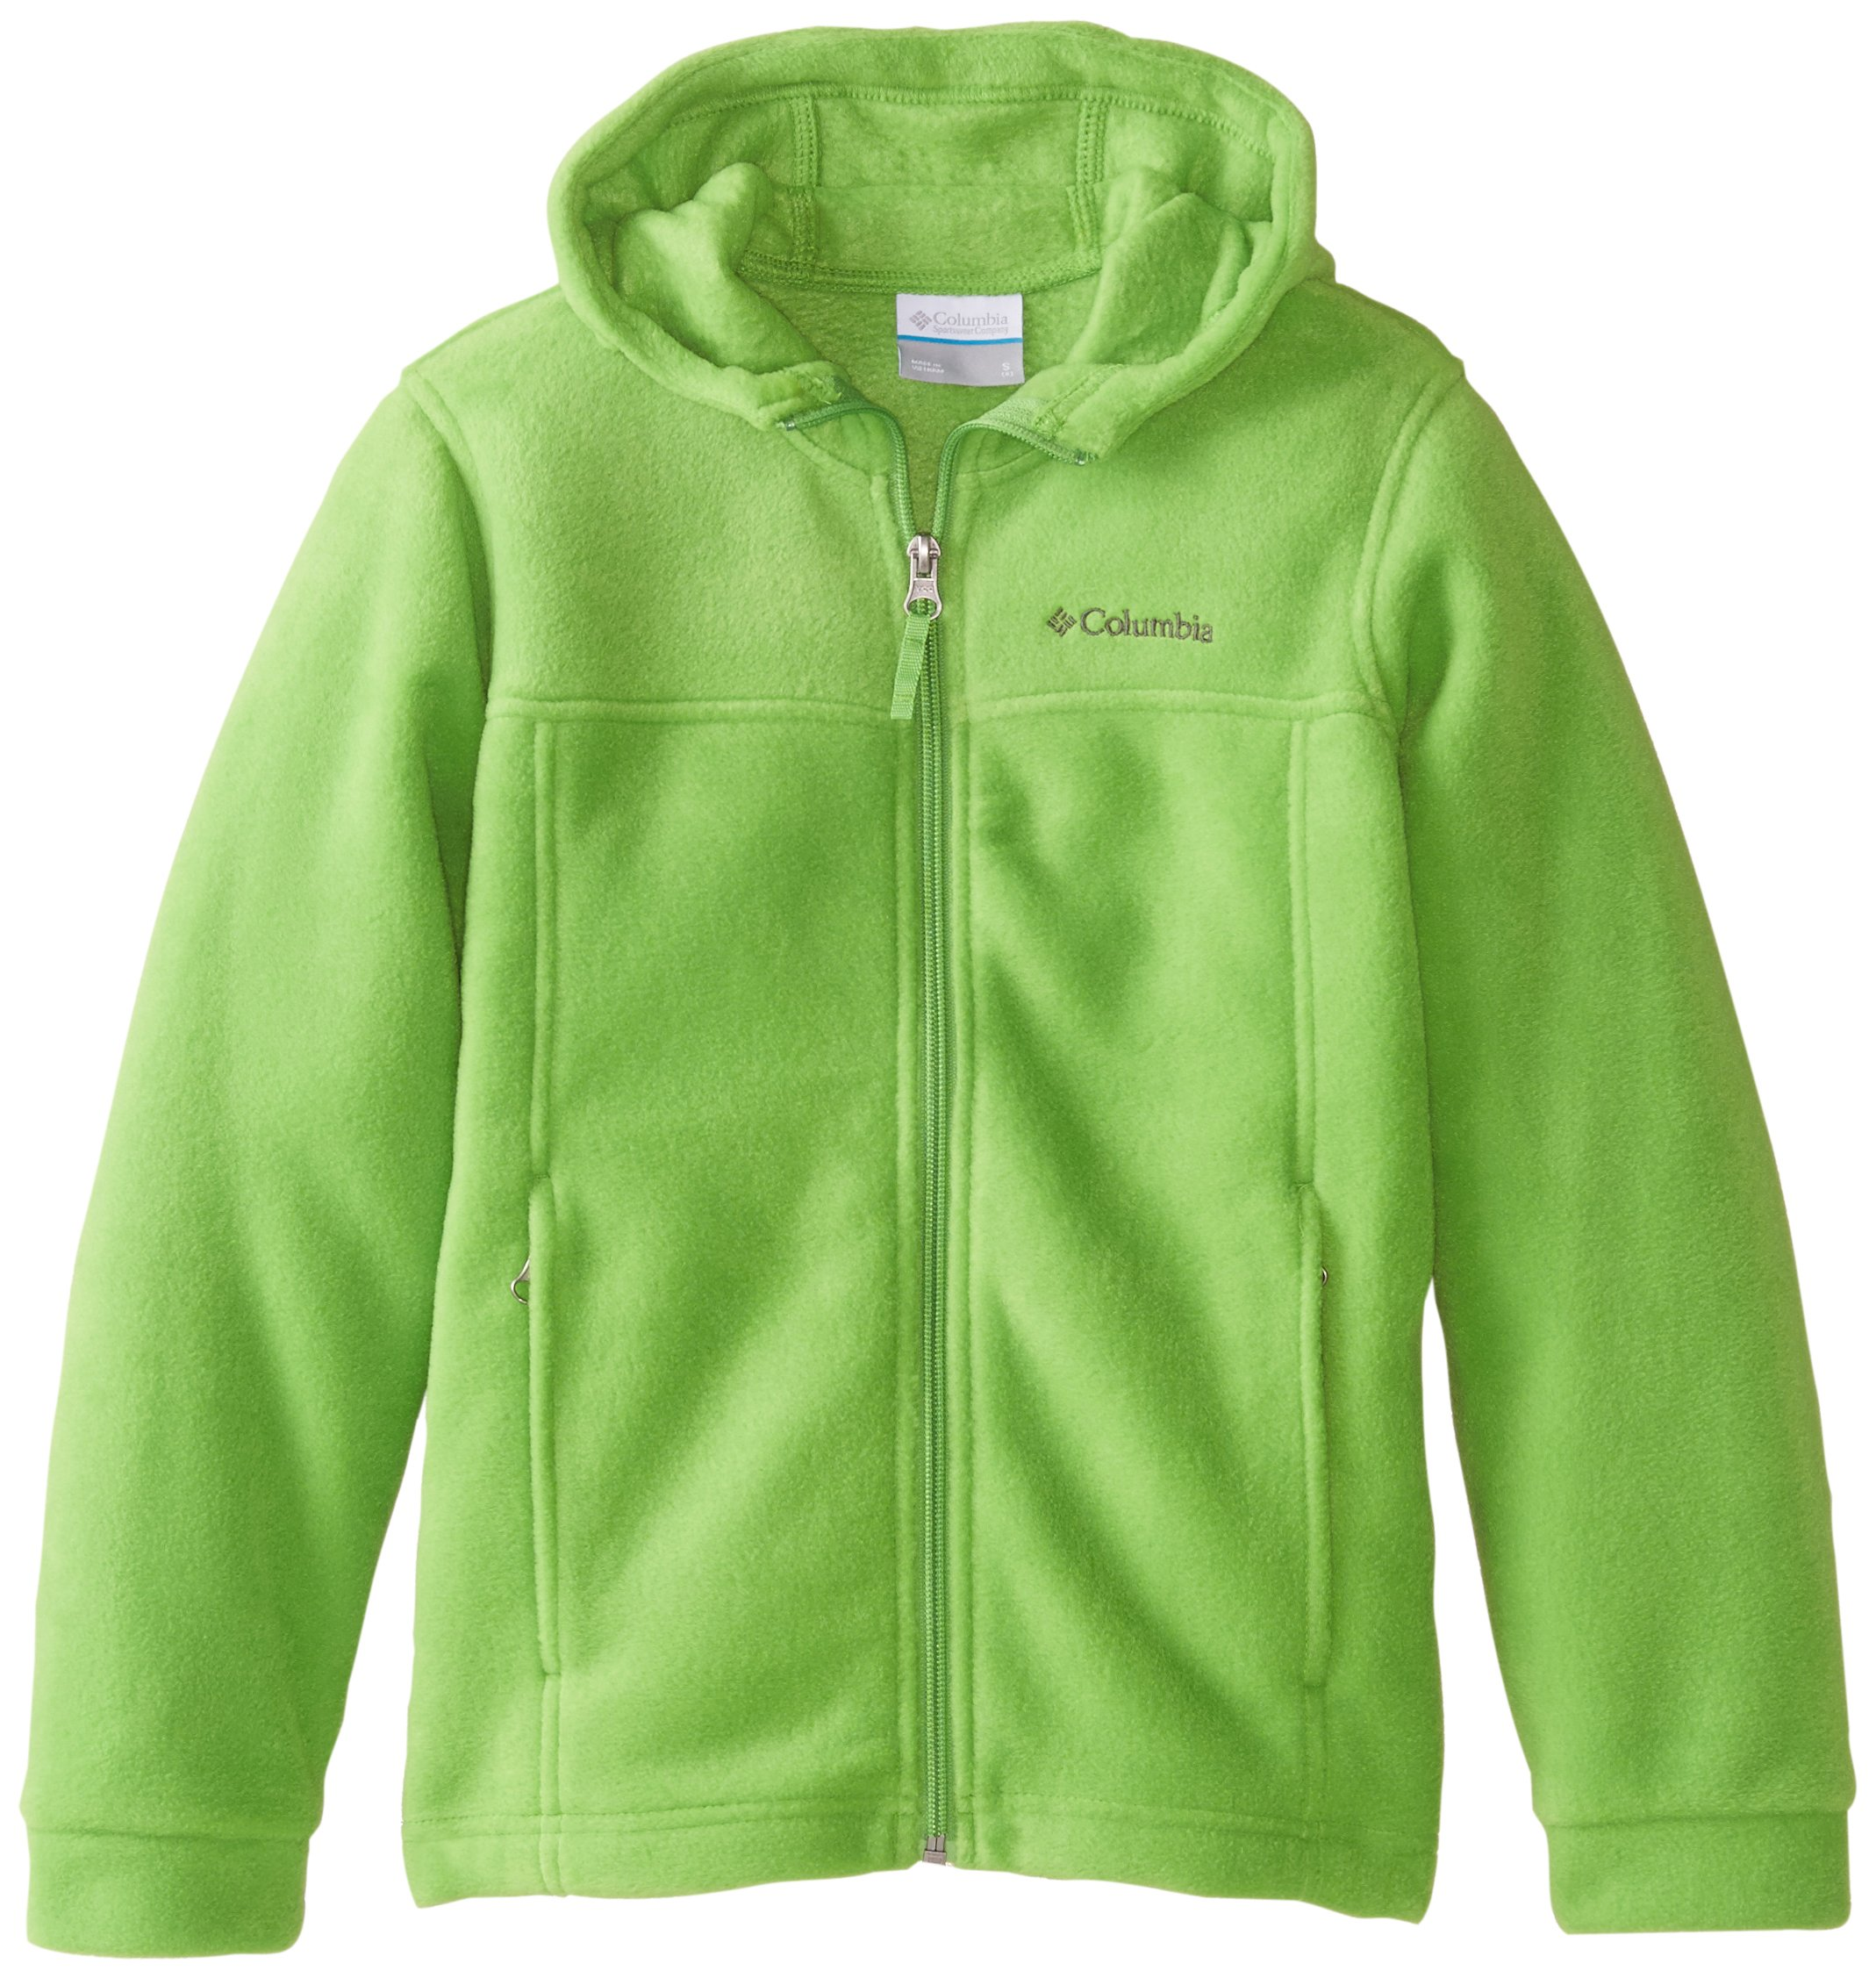 87b5ec846 Galleon - Columbia Big Boys' Steens II Fleece Hoodie, Cyber Green, X-Large